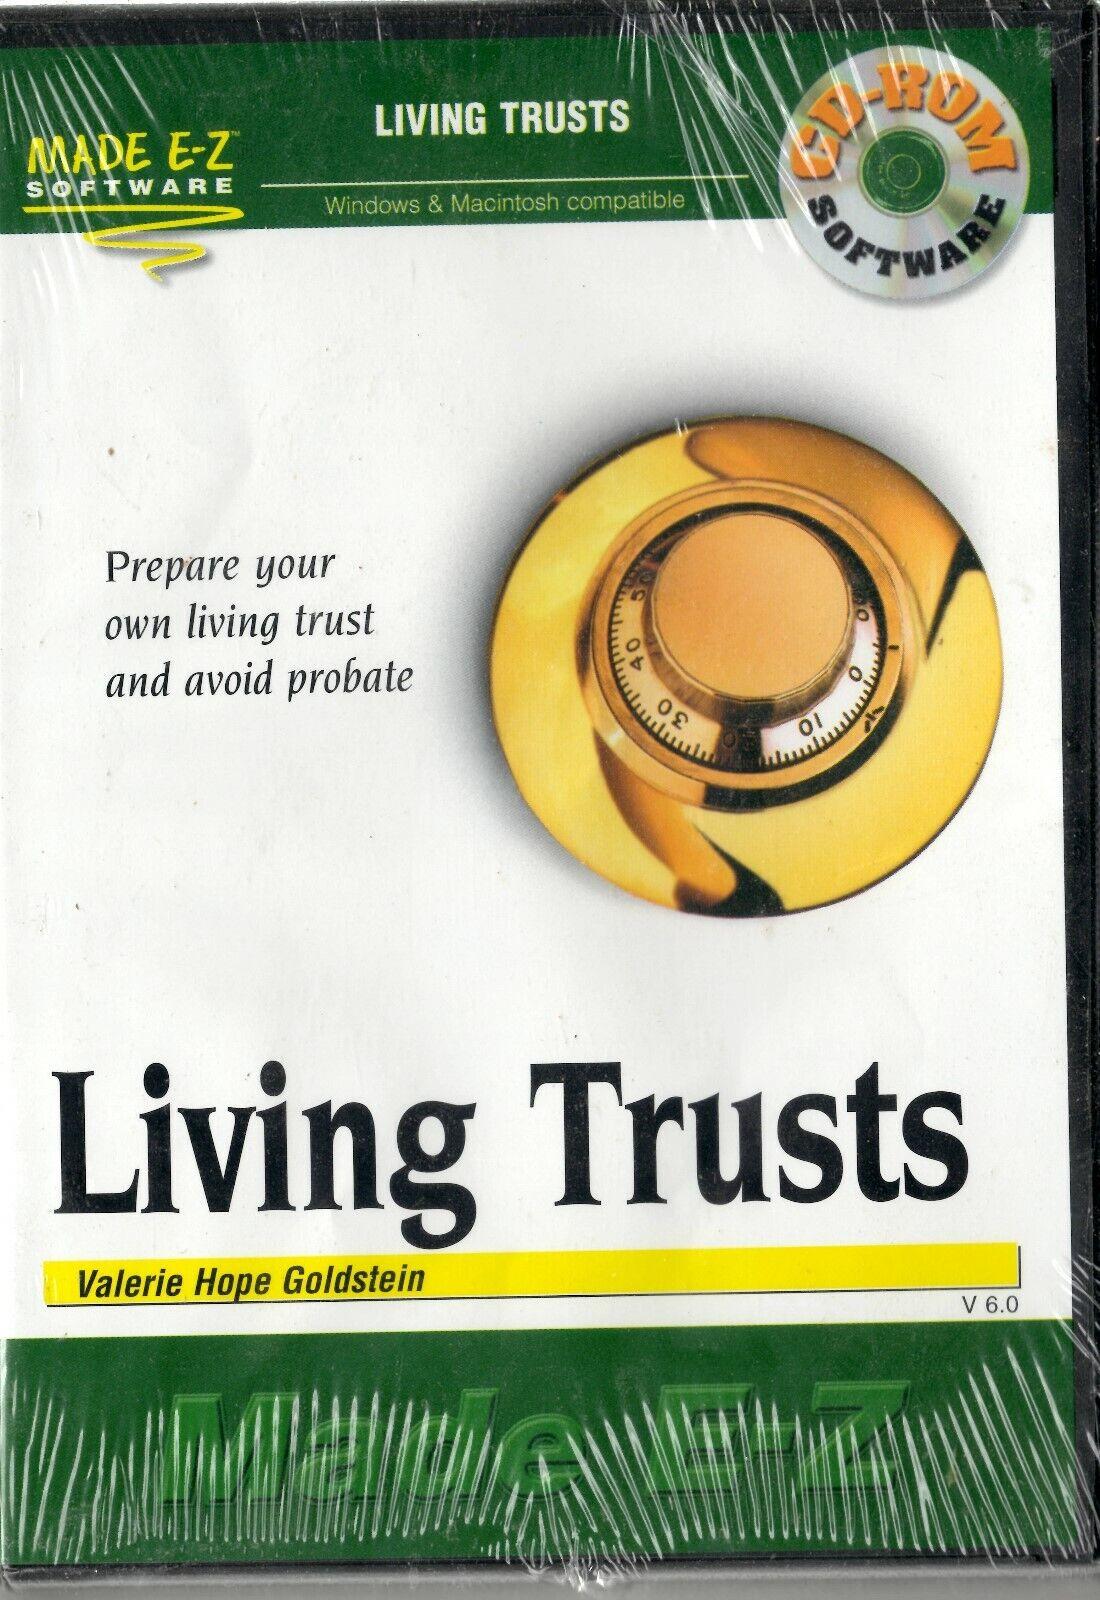 Made E-Z Software - Living Trusts - CD-ROM 2001